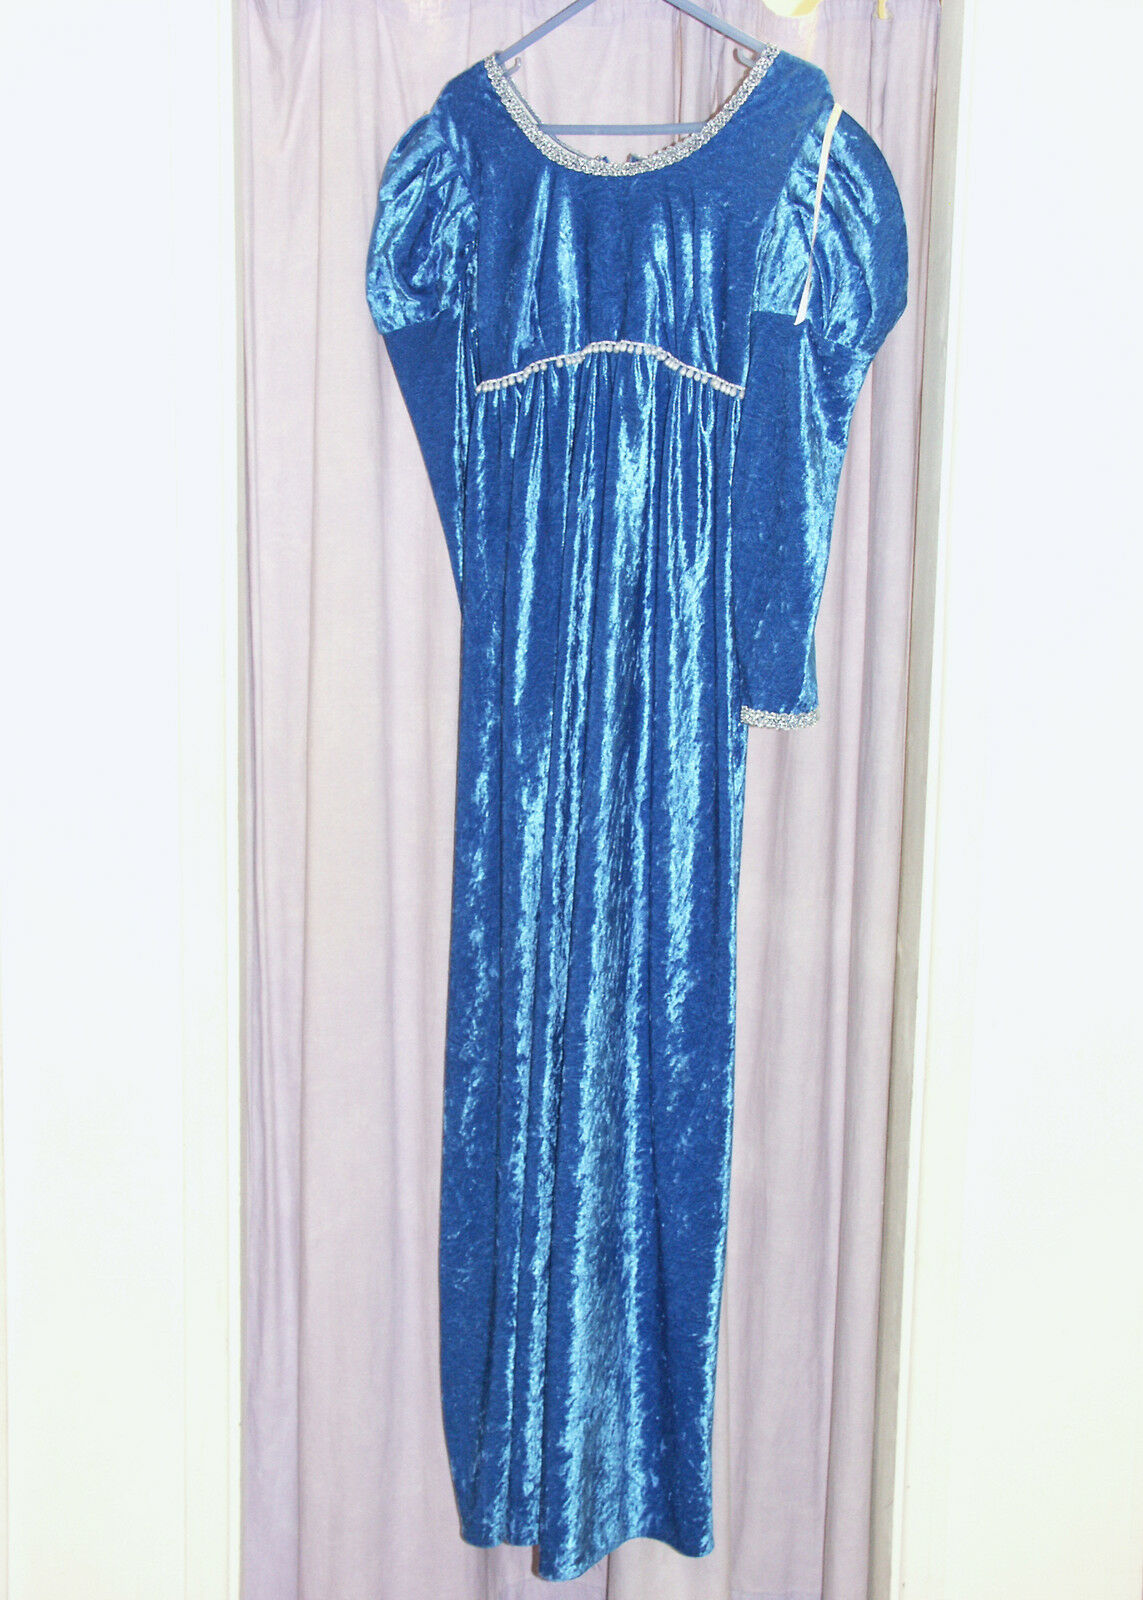 Women's Velvet Medieval Tudor Juliet Princess Hire Quality Costume UK 14 -16